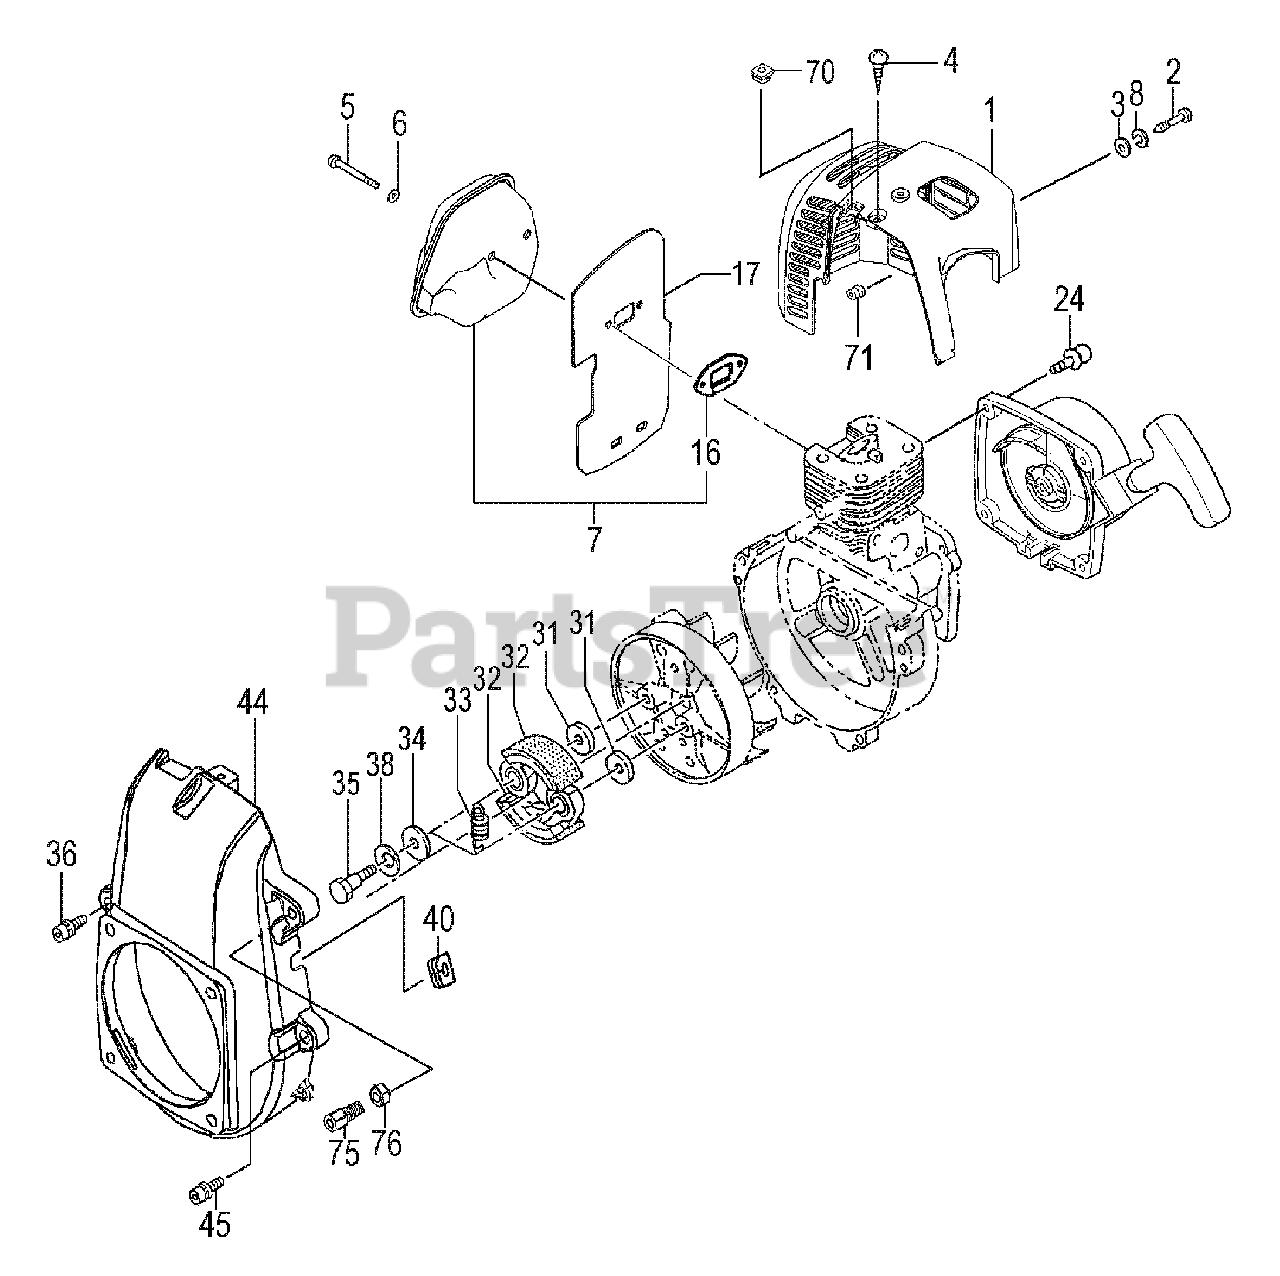 moped engine schematics scooter engine diagram wiring diagrams show  scooter engine diagram wiring